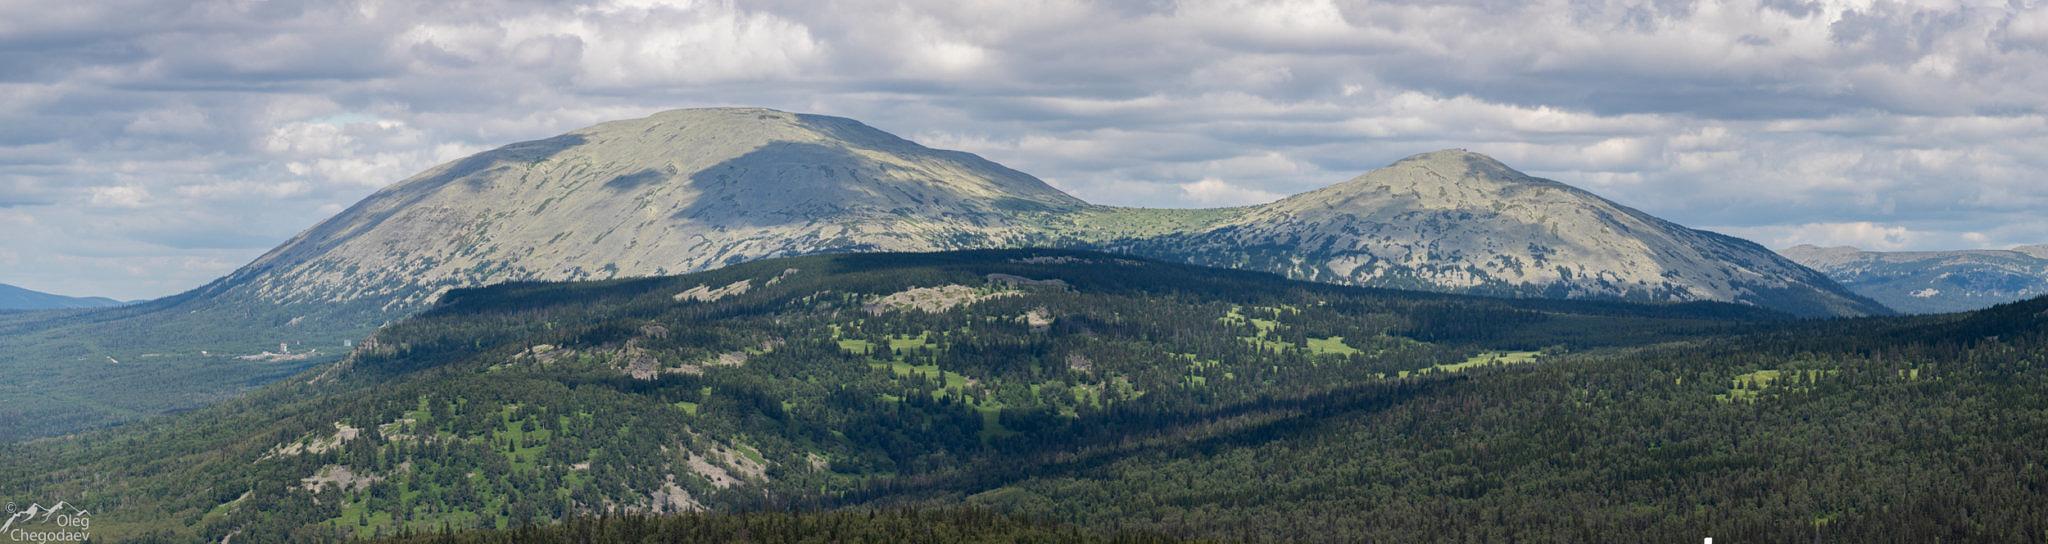 Горы Ямантау и Куянтау с горы Кусейматау